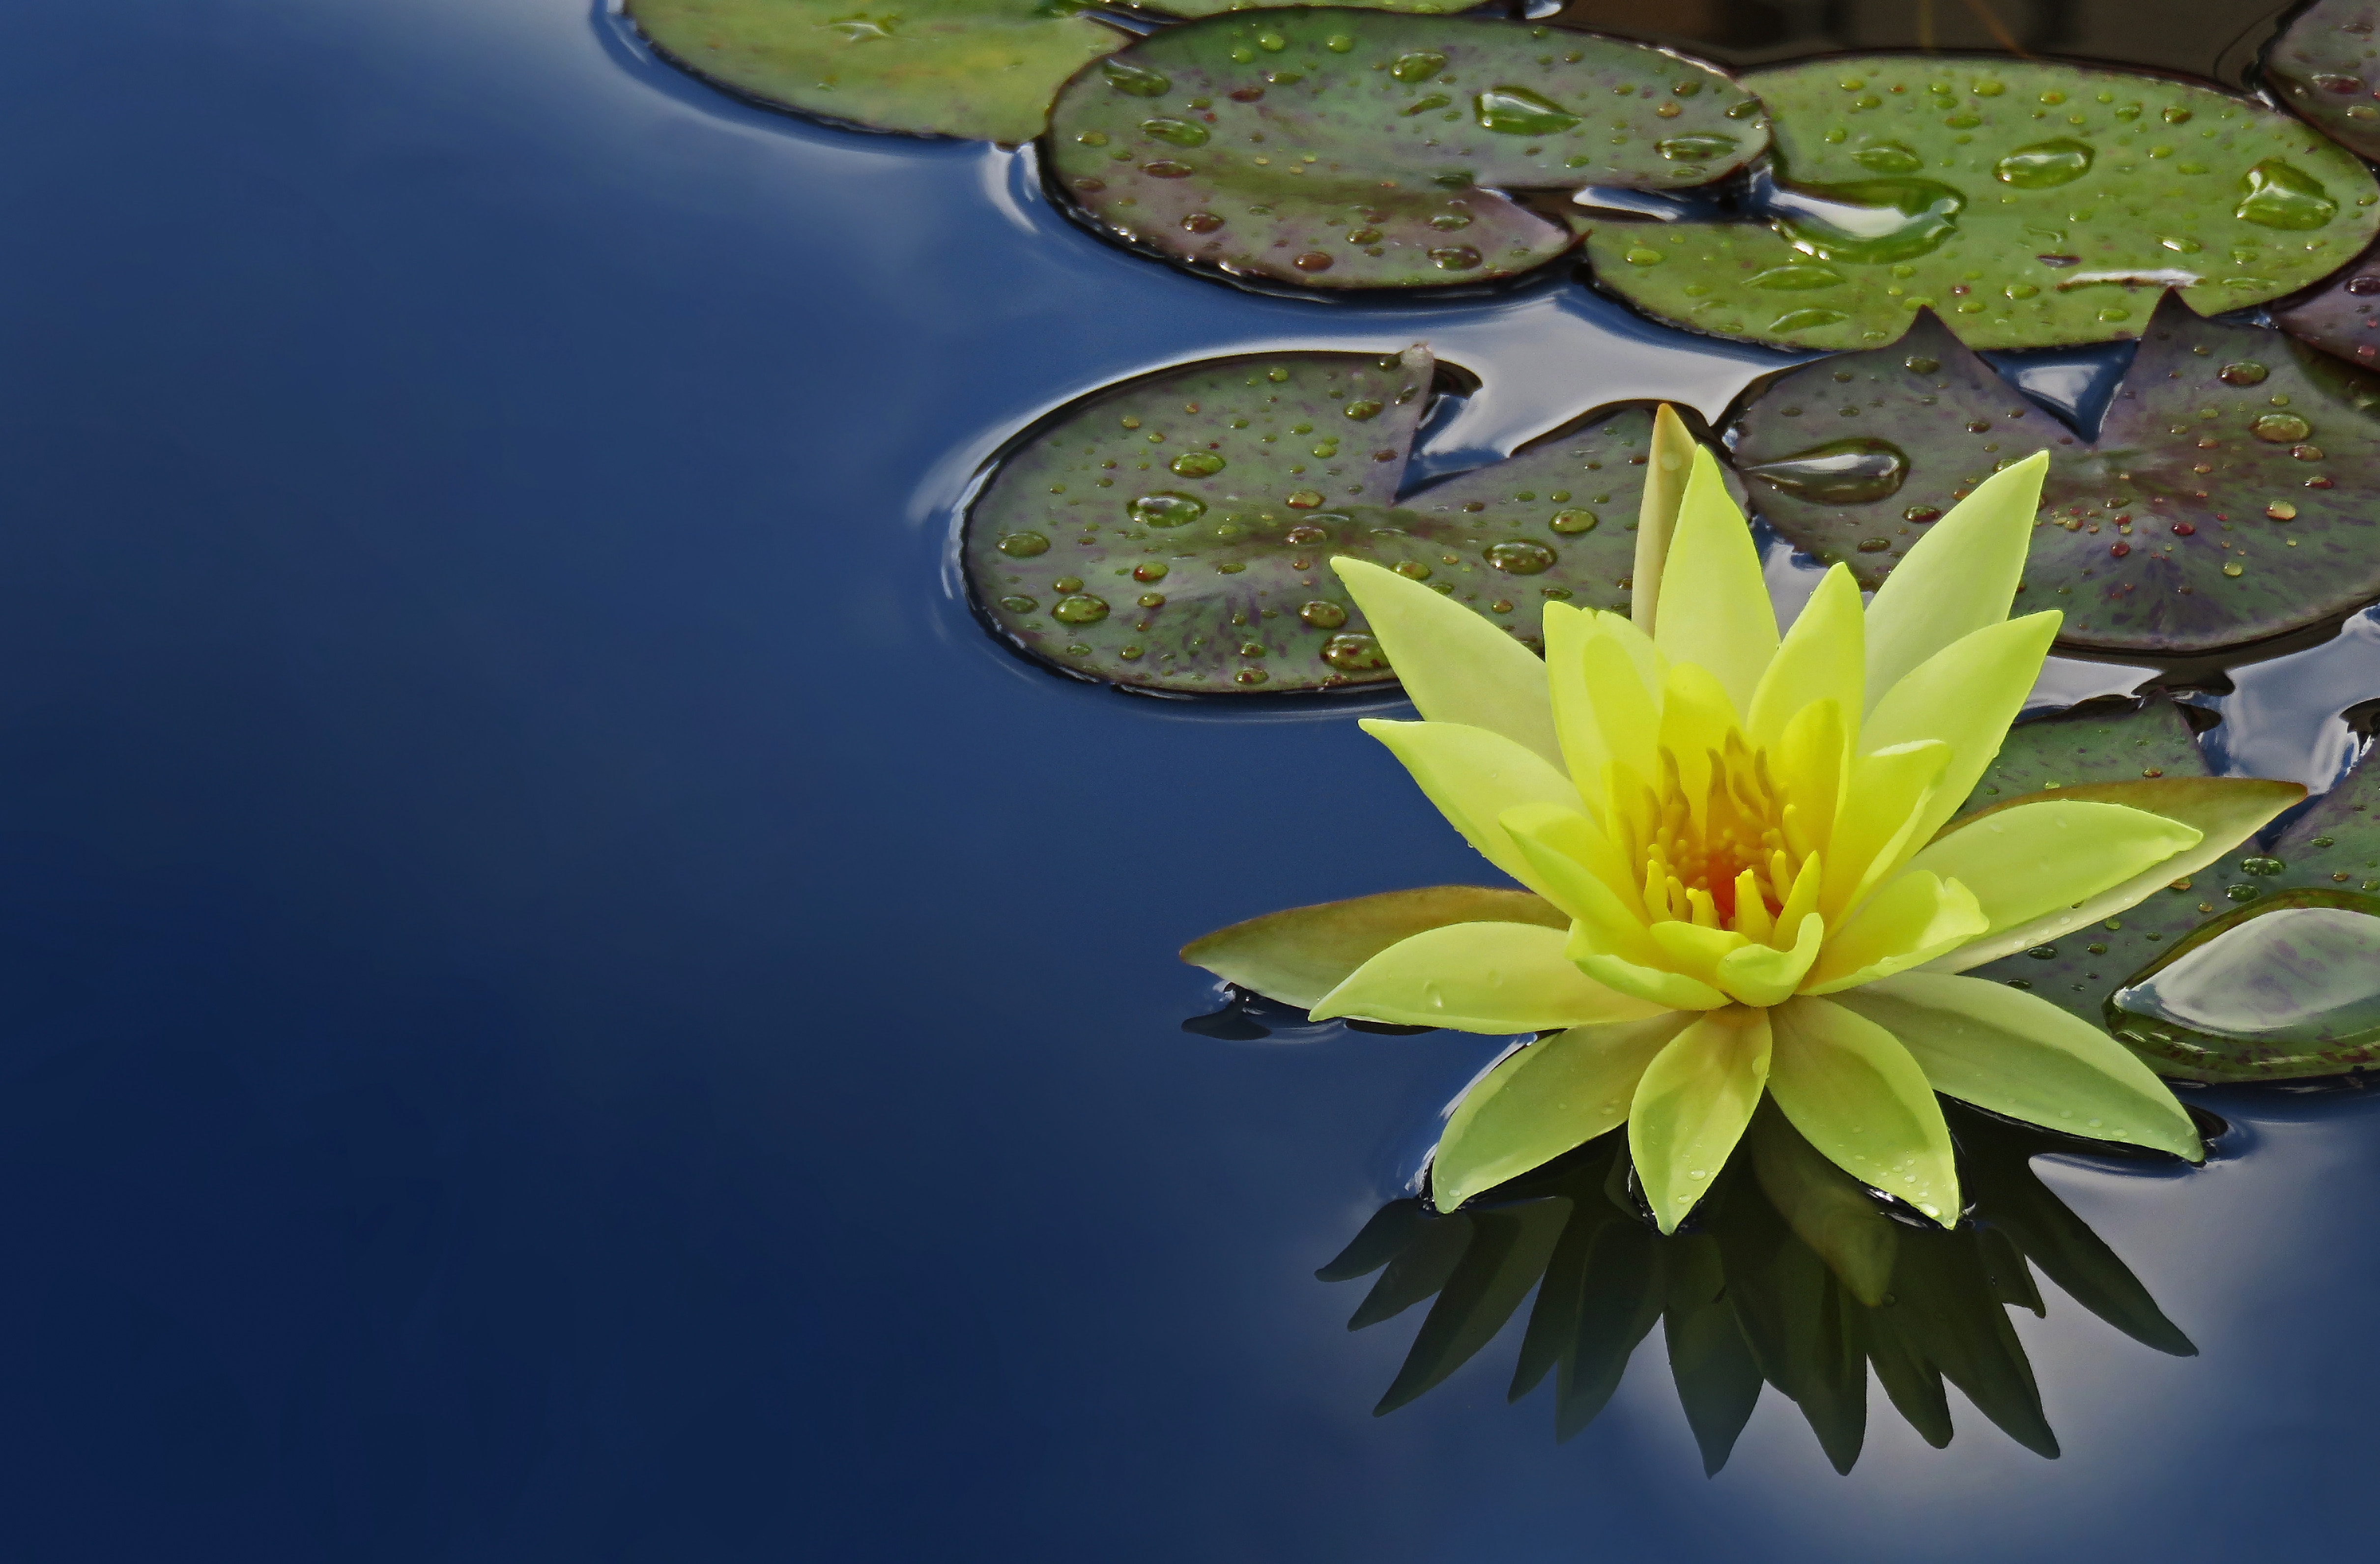 Spa Services - lotus on pool